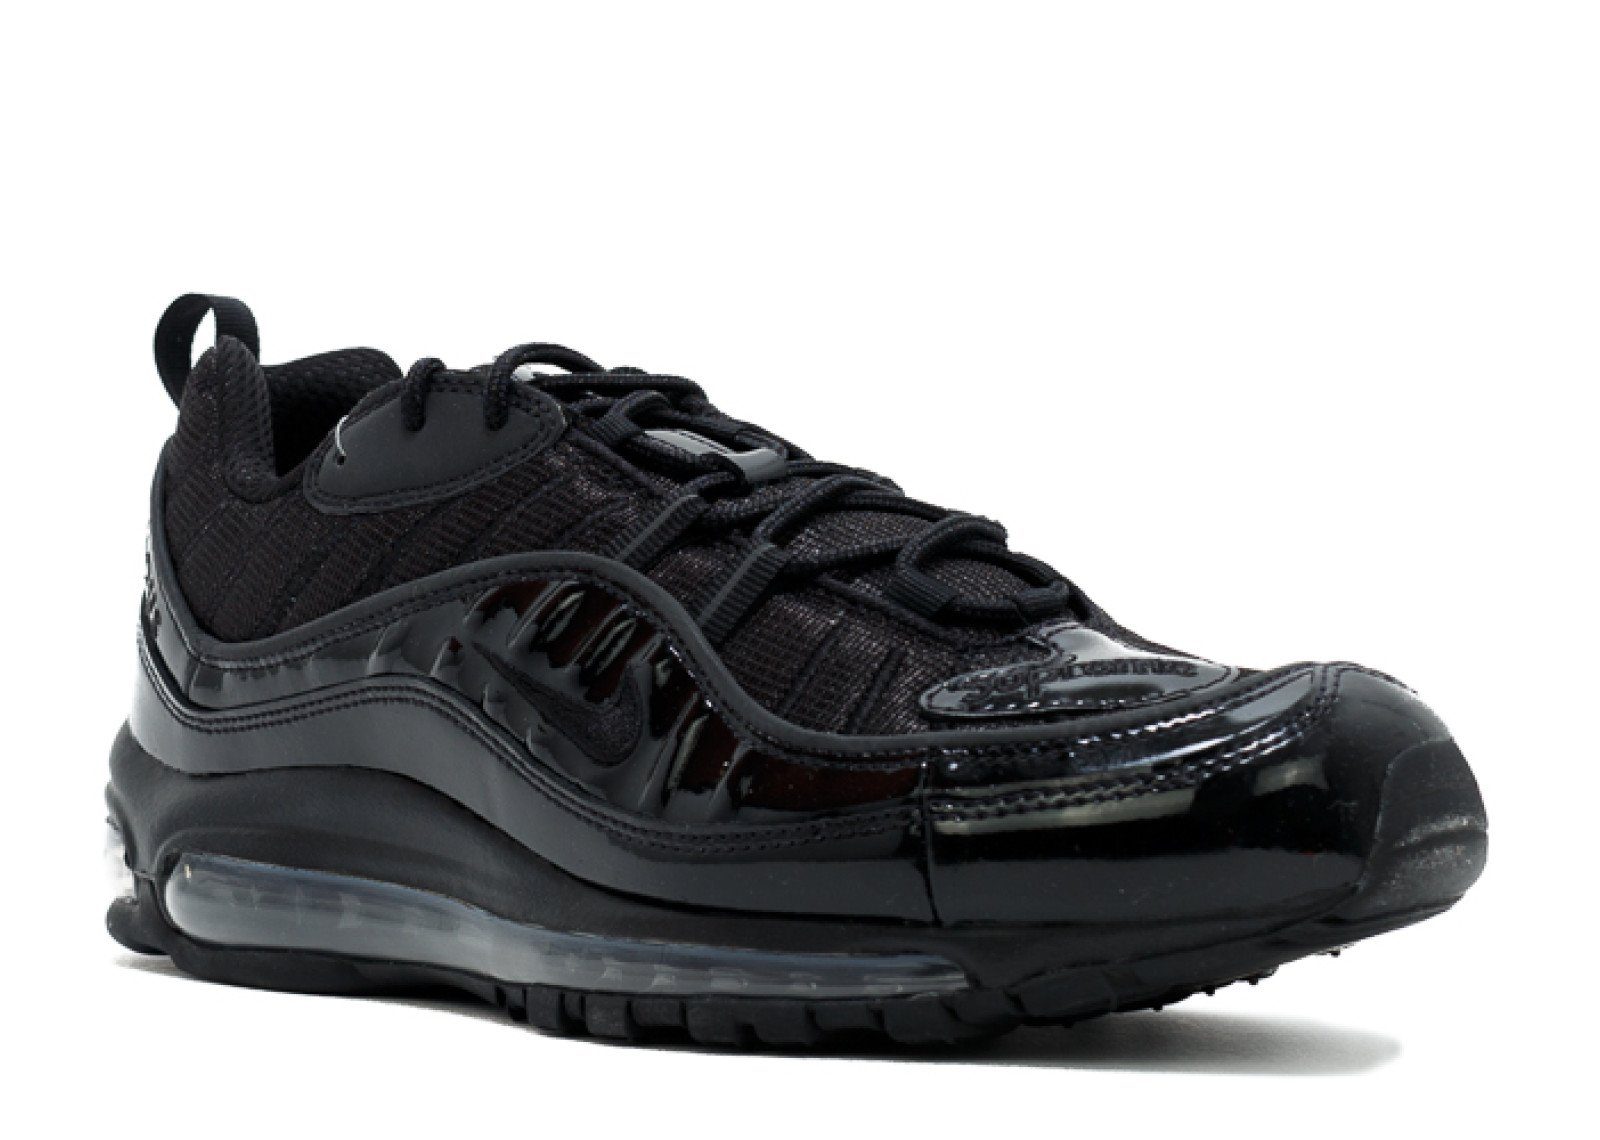 71IrUMbijNL - Nike Men's Air Max 98 / Supreme Running Shoes